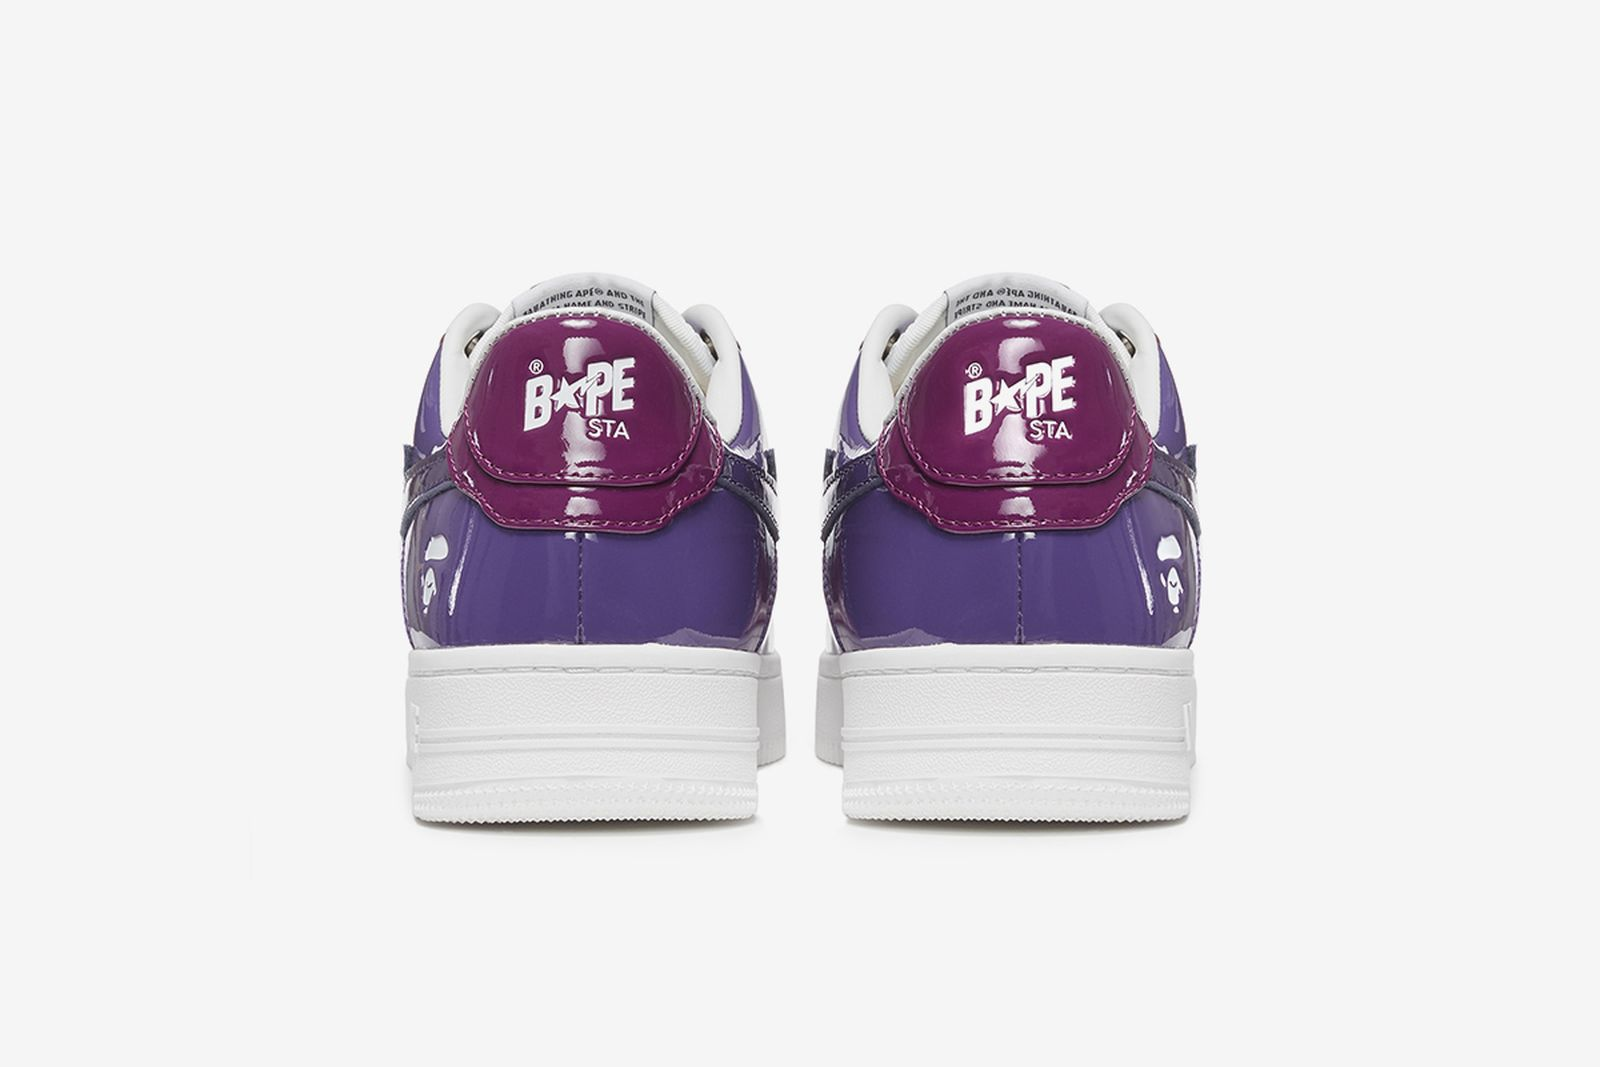 bape-sta-color-camo-combo-release-date-price-14